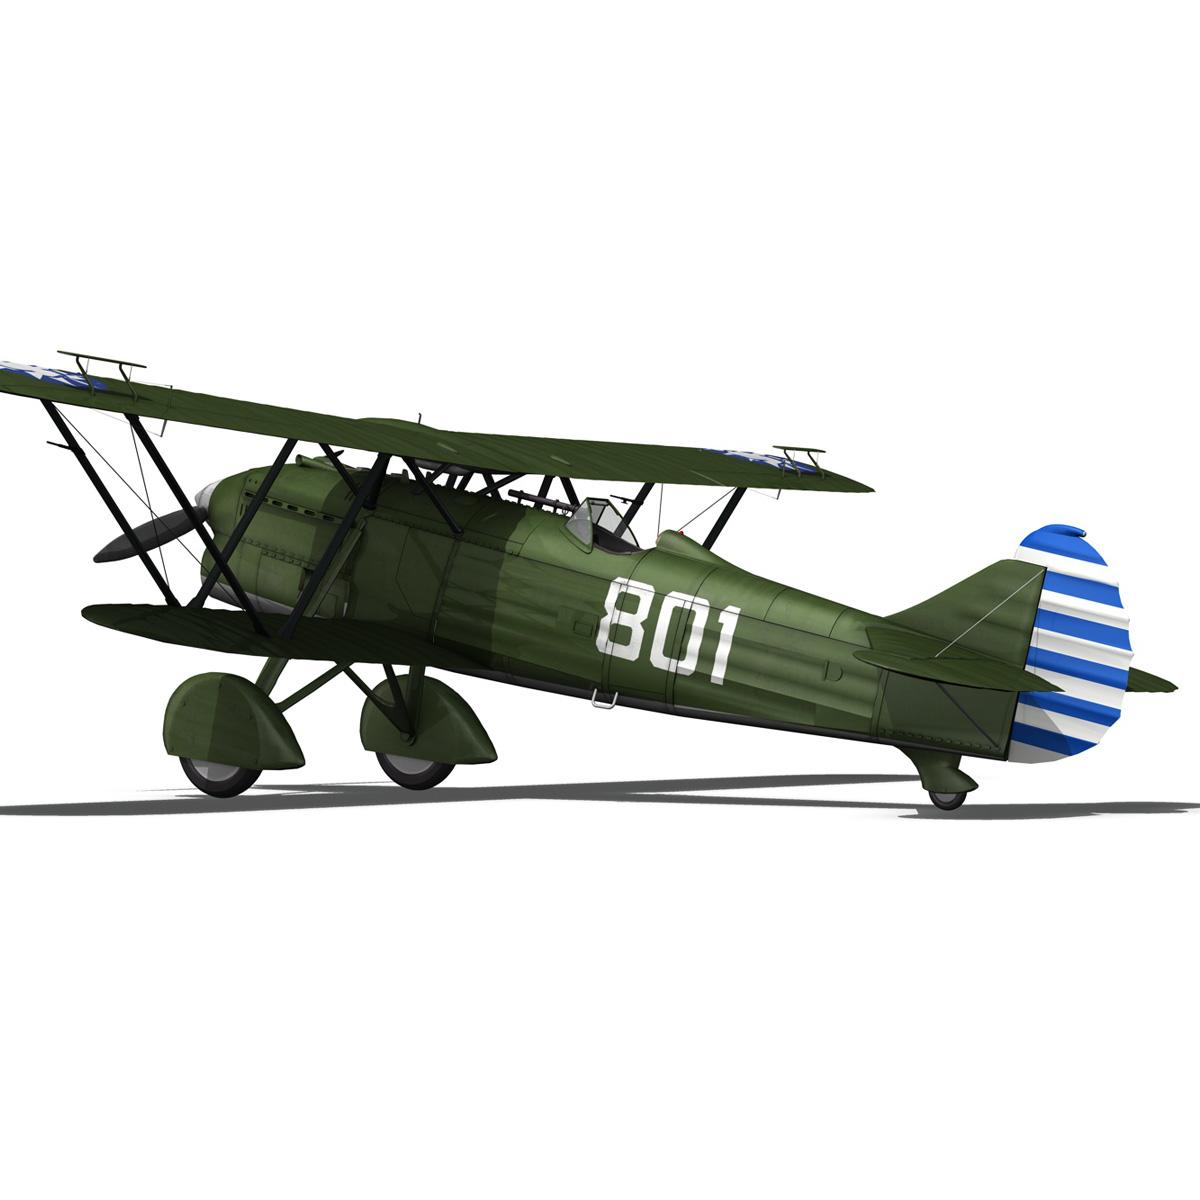 fiat cr.32 – chinese nationalist air force 3d model fbx c4d lwo obj 272637